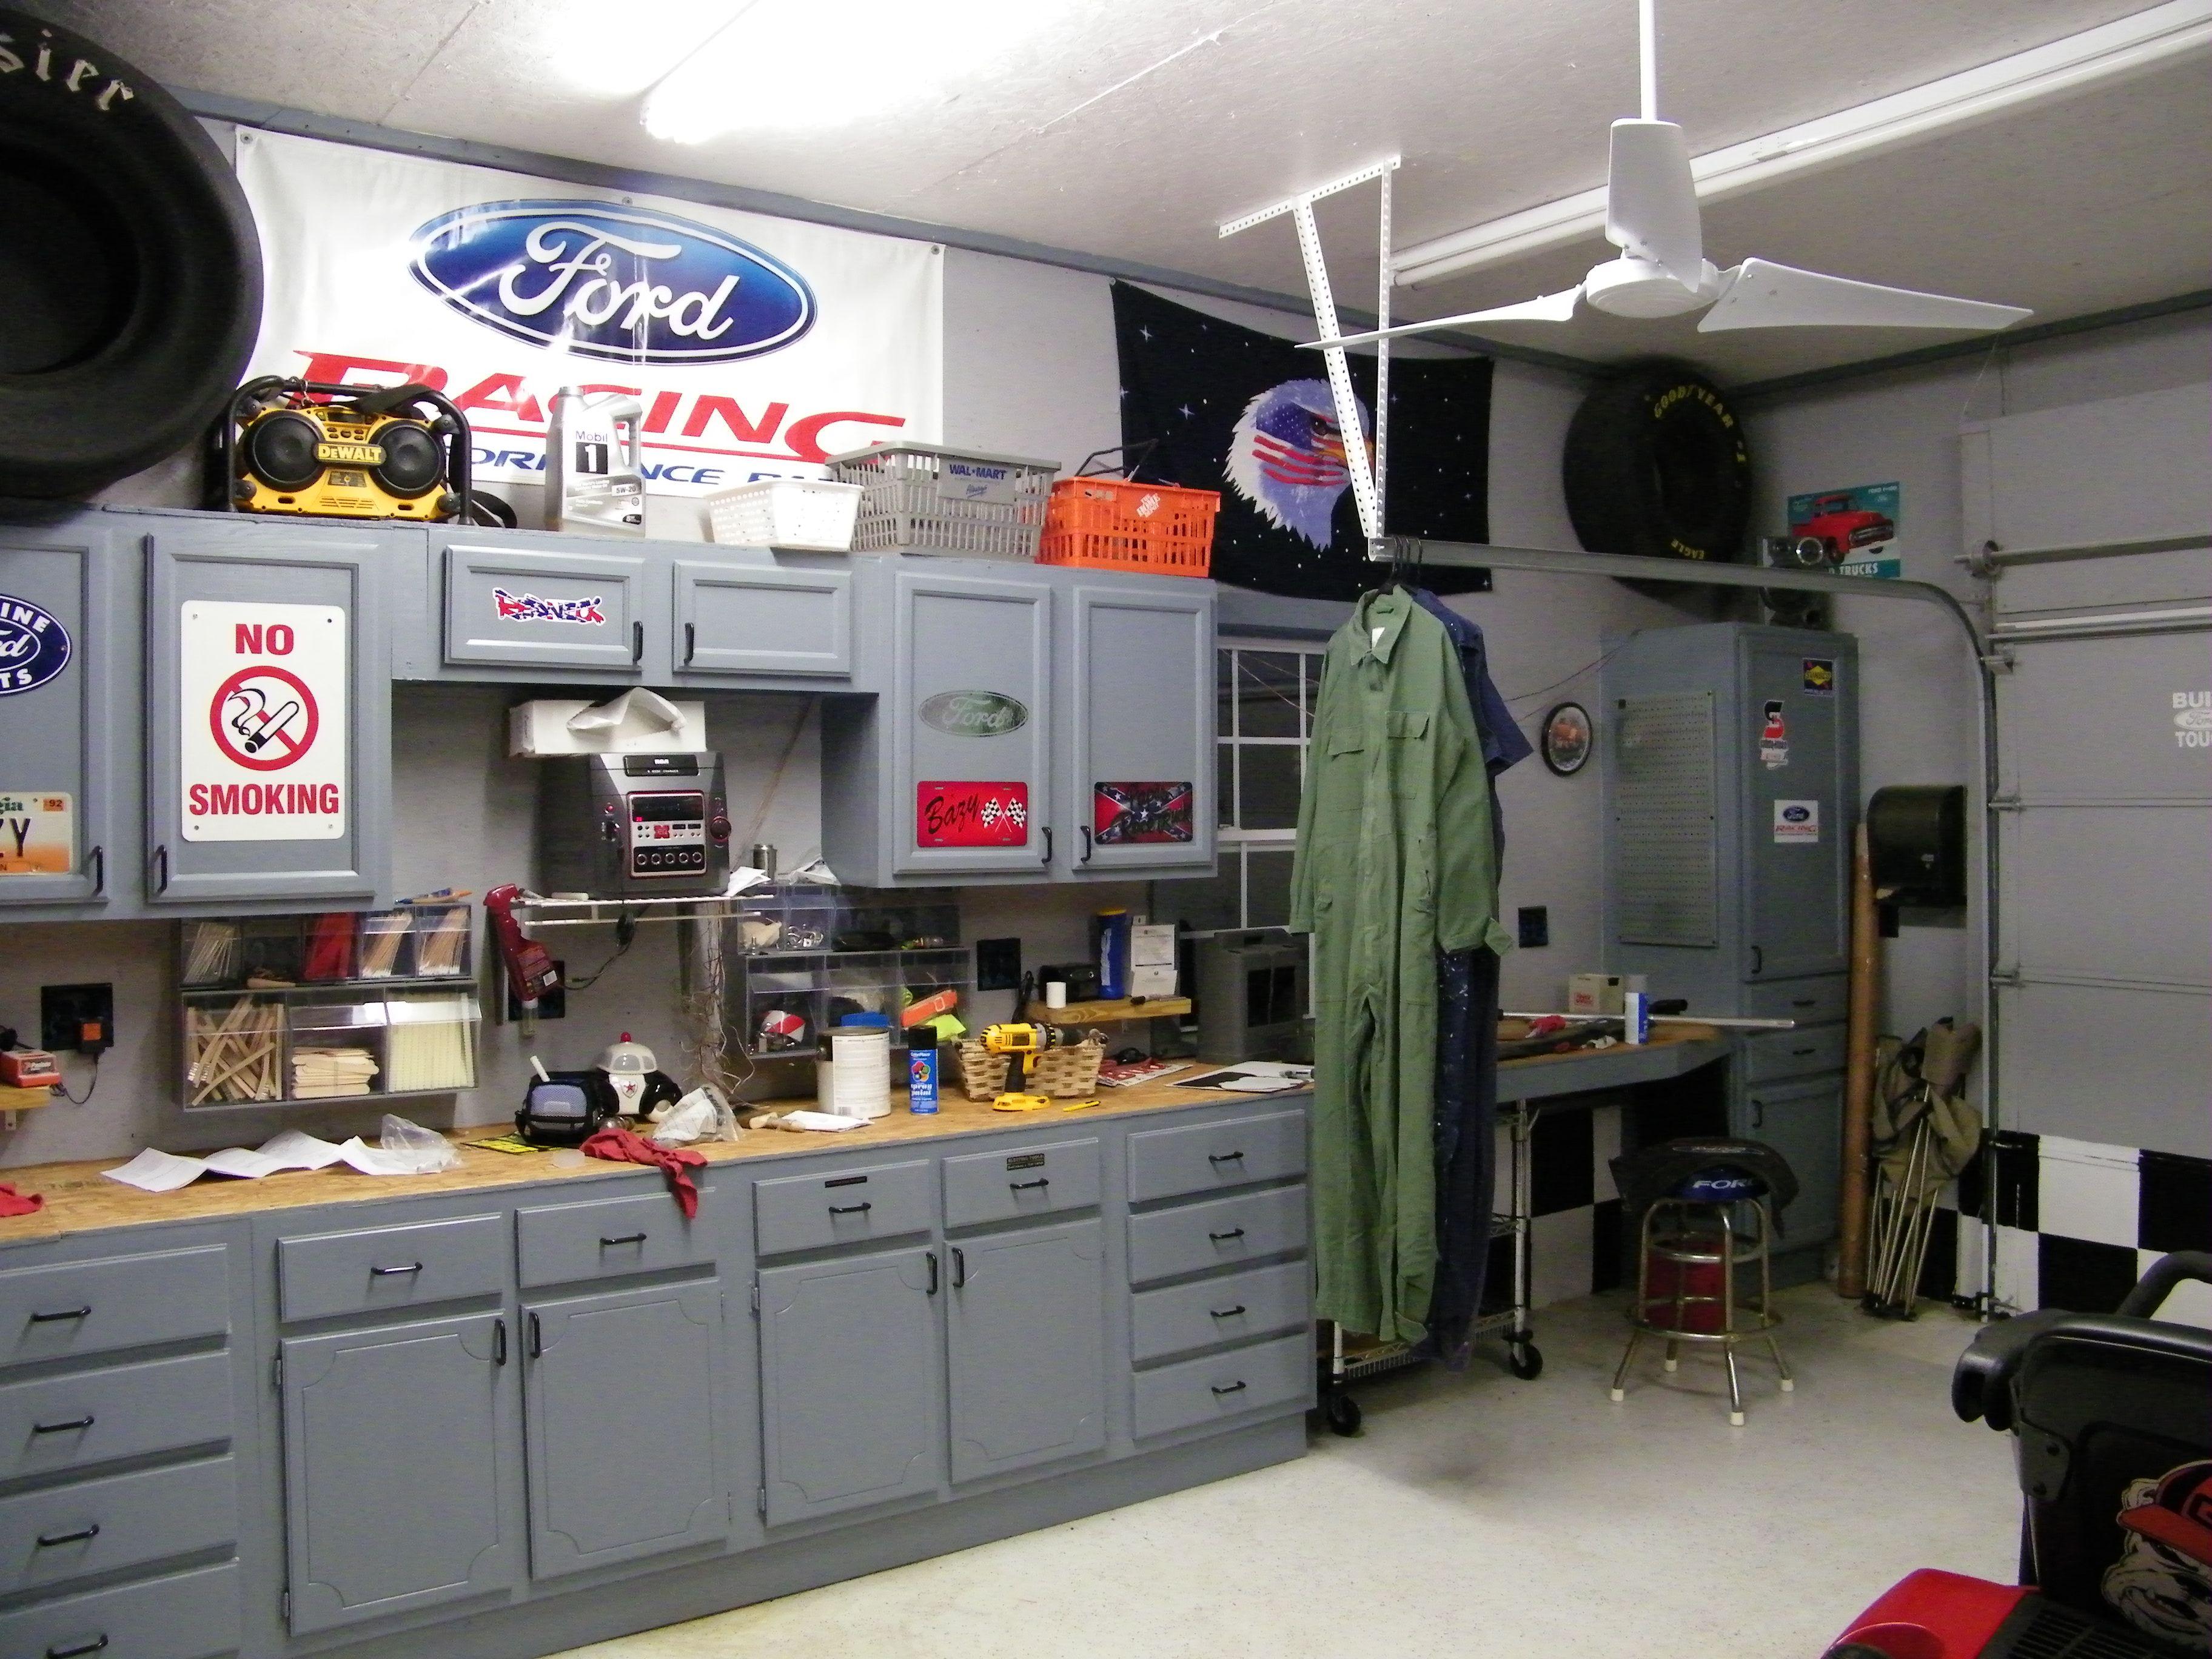 Man Cave Garage Hd Widescreen 11 Hd Wallpapers